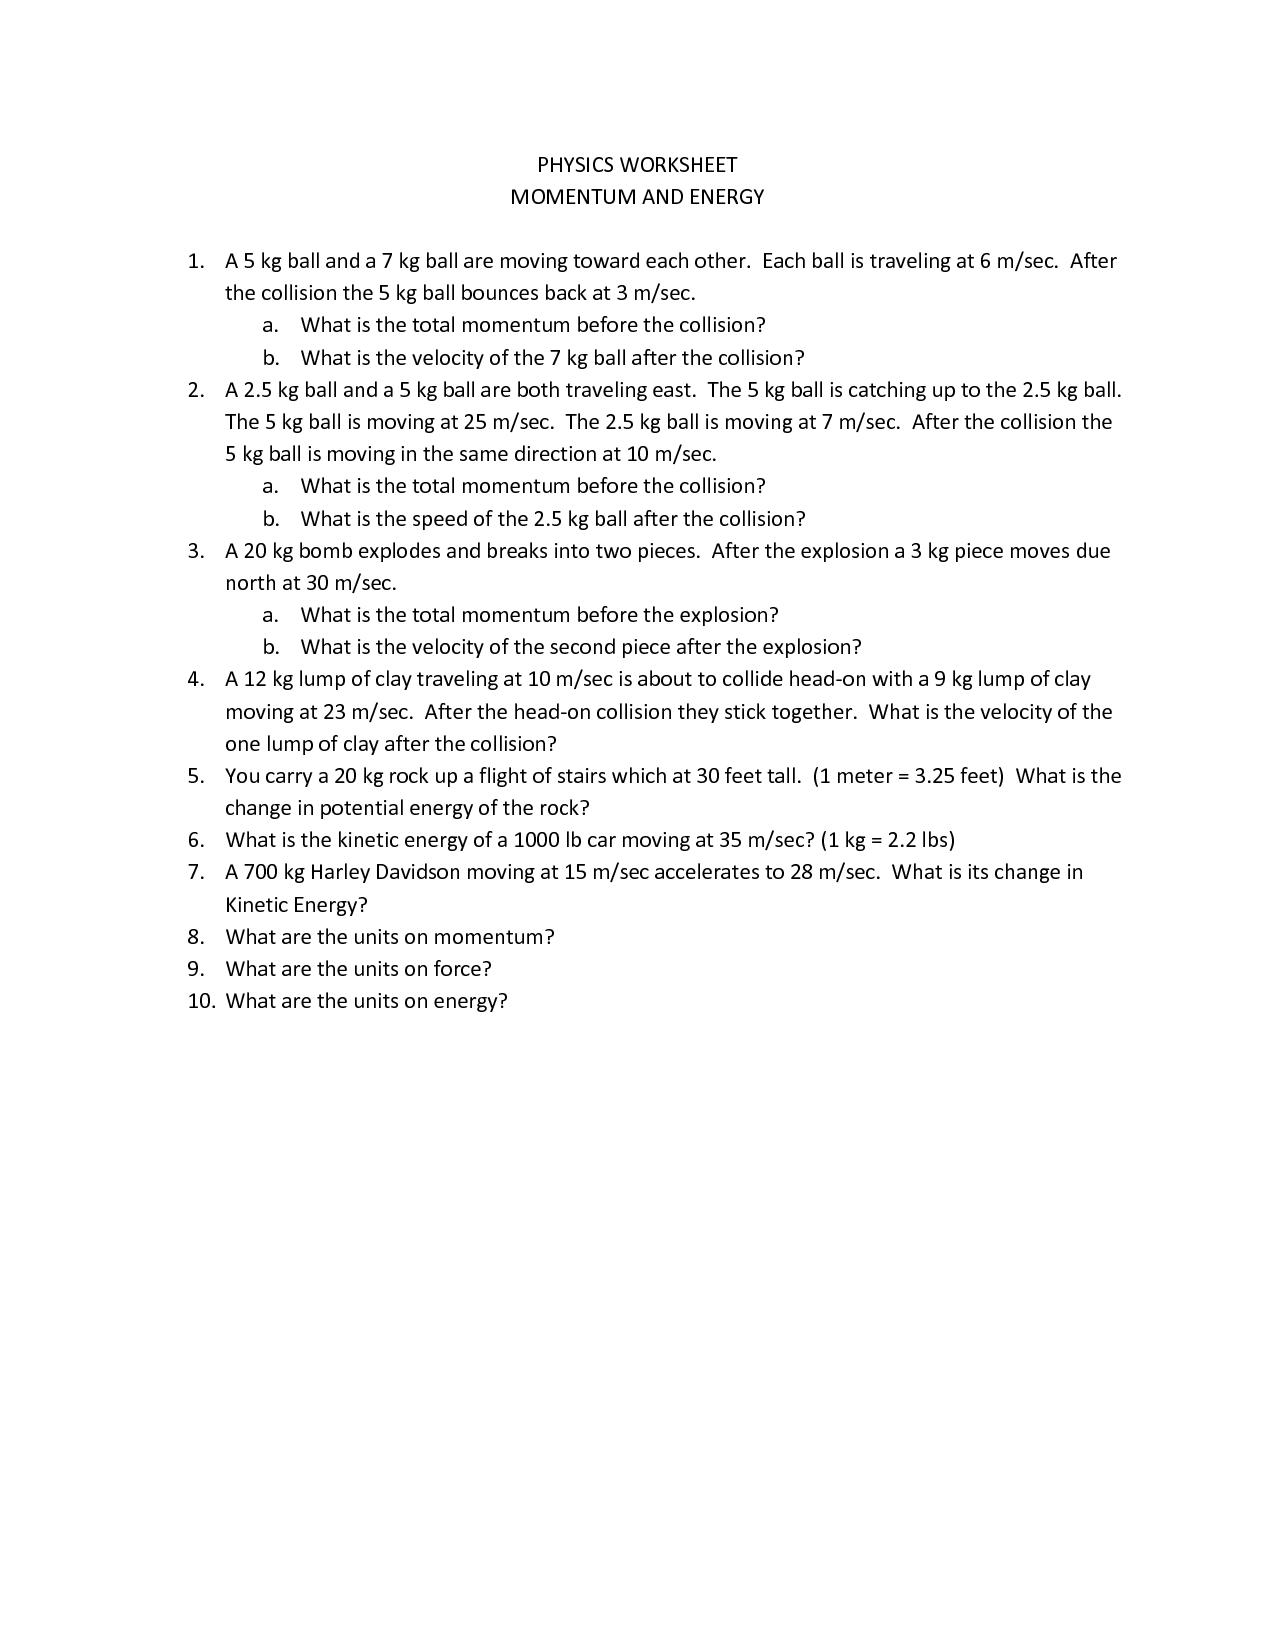 Work Problems Physics Worksheet